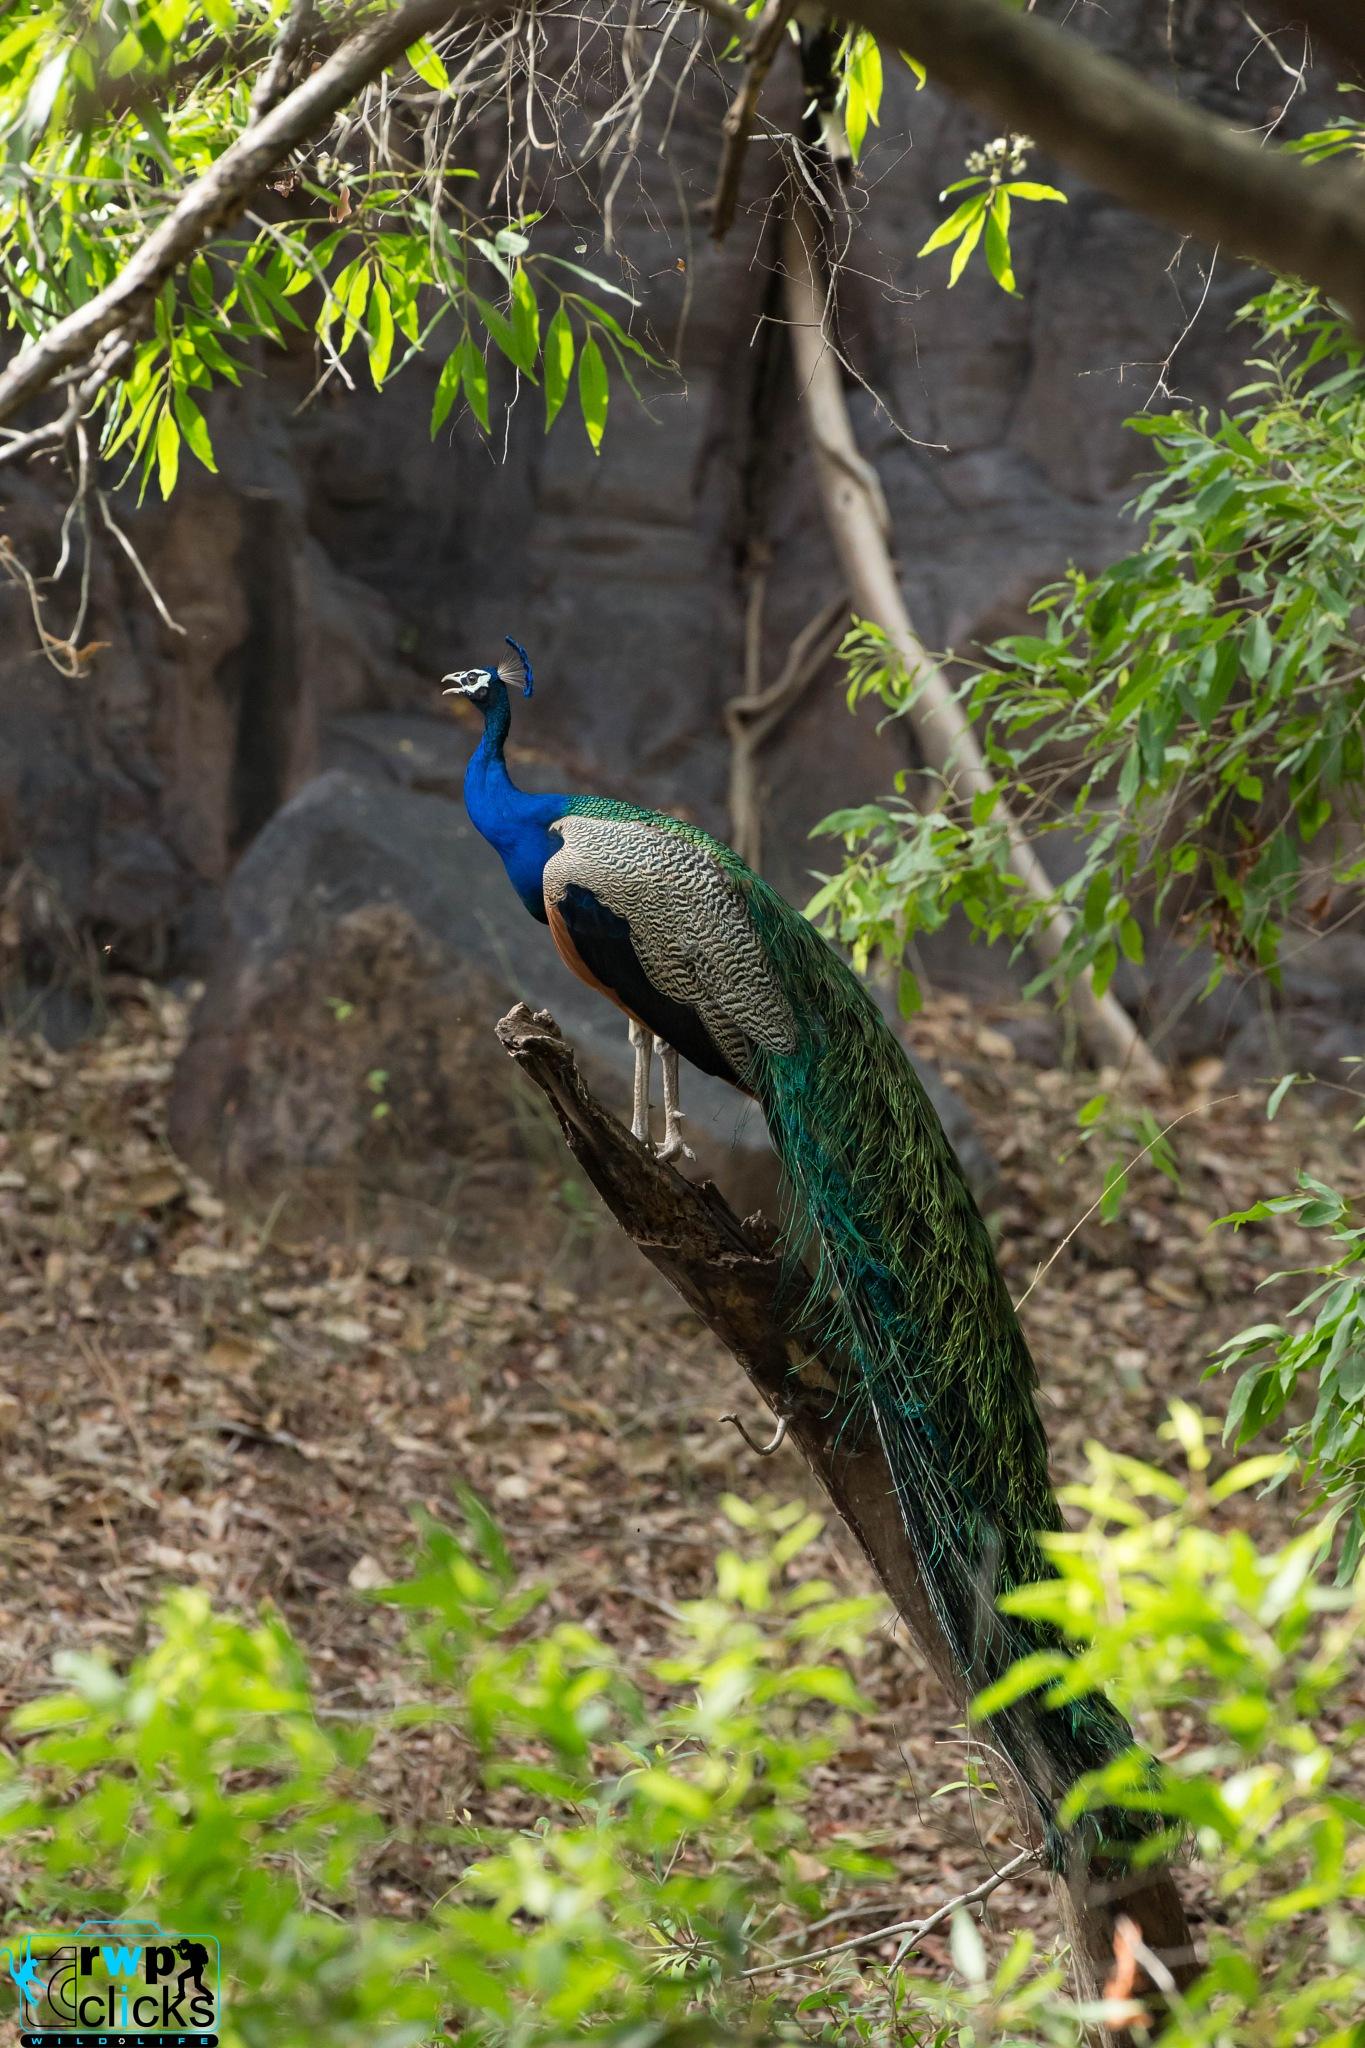 Indian Peafowl by Rajesh W. Pereira